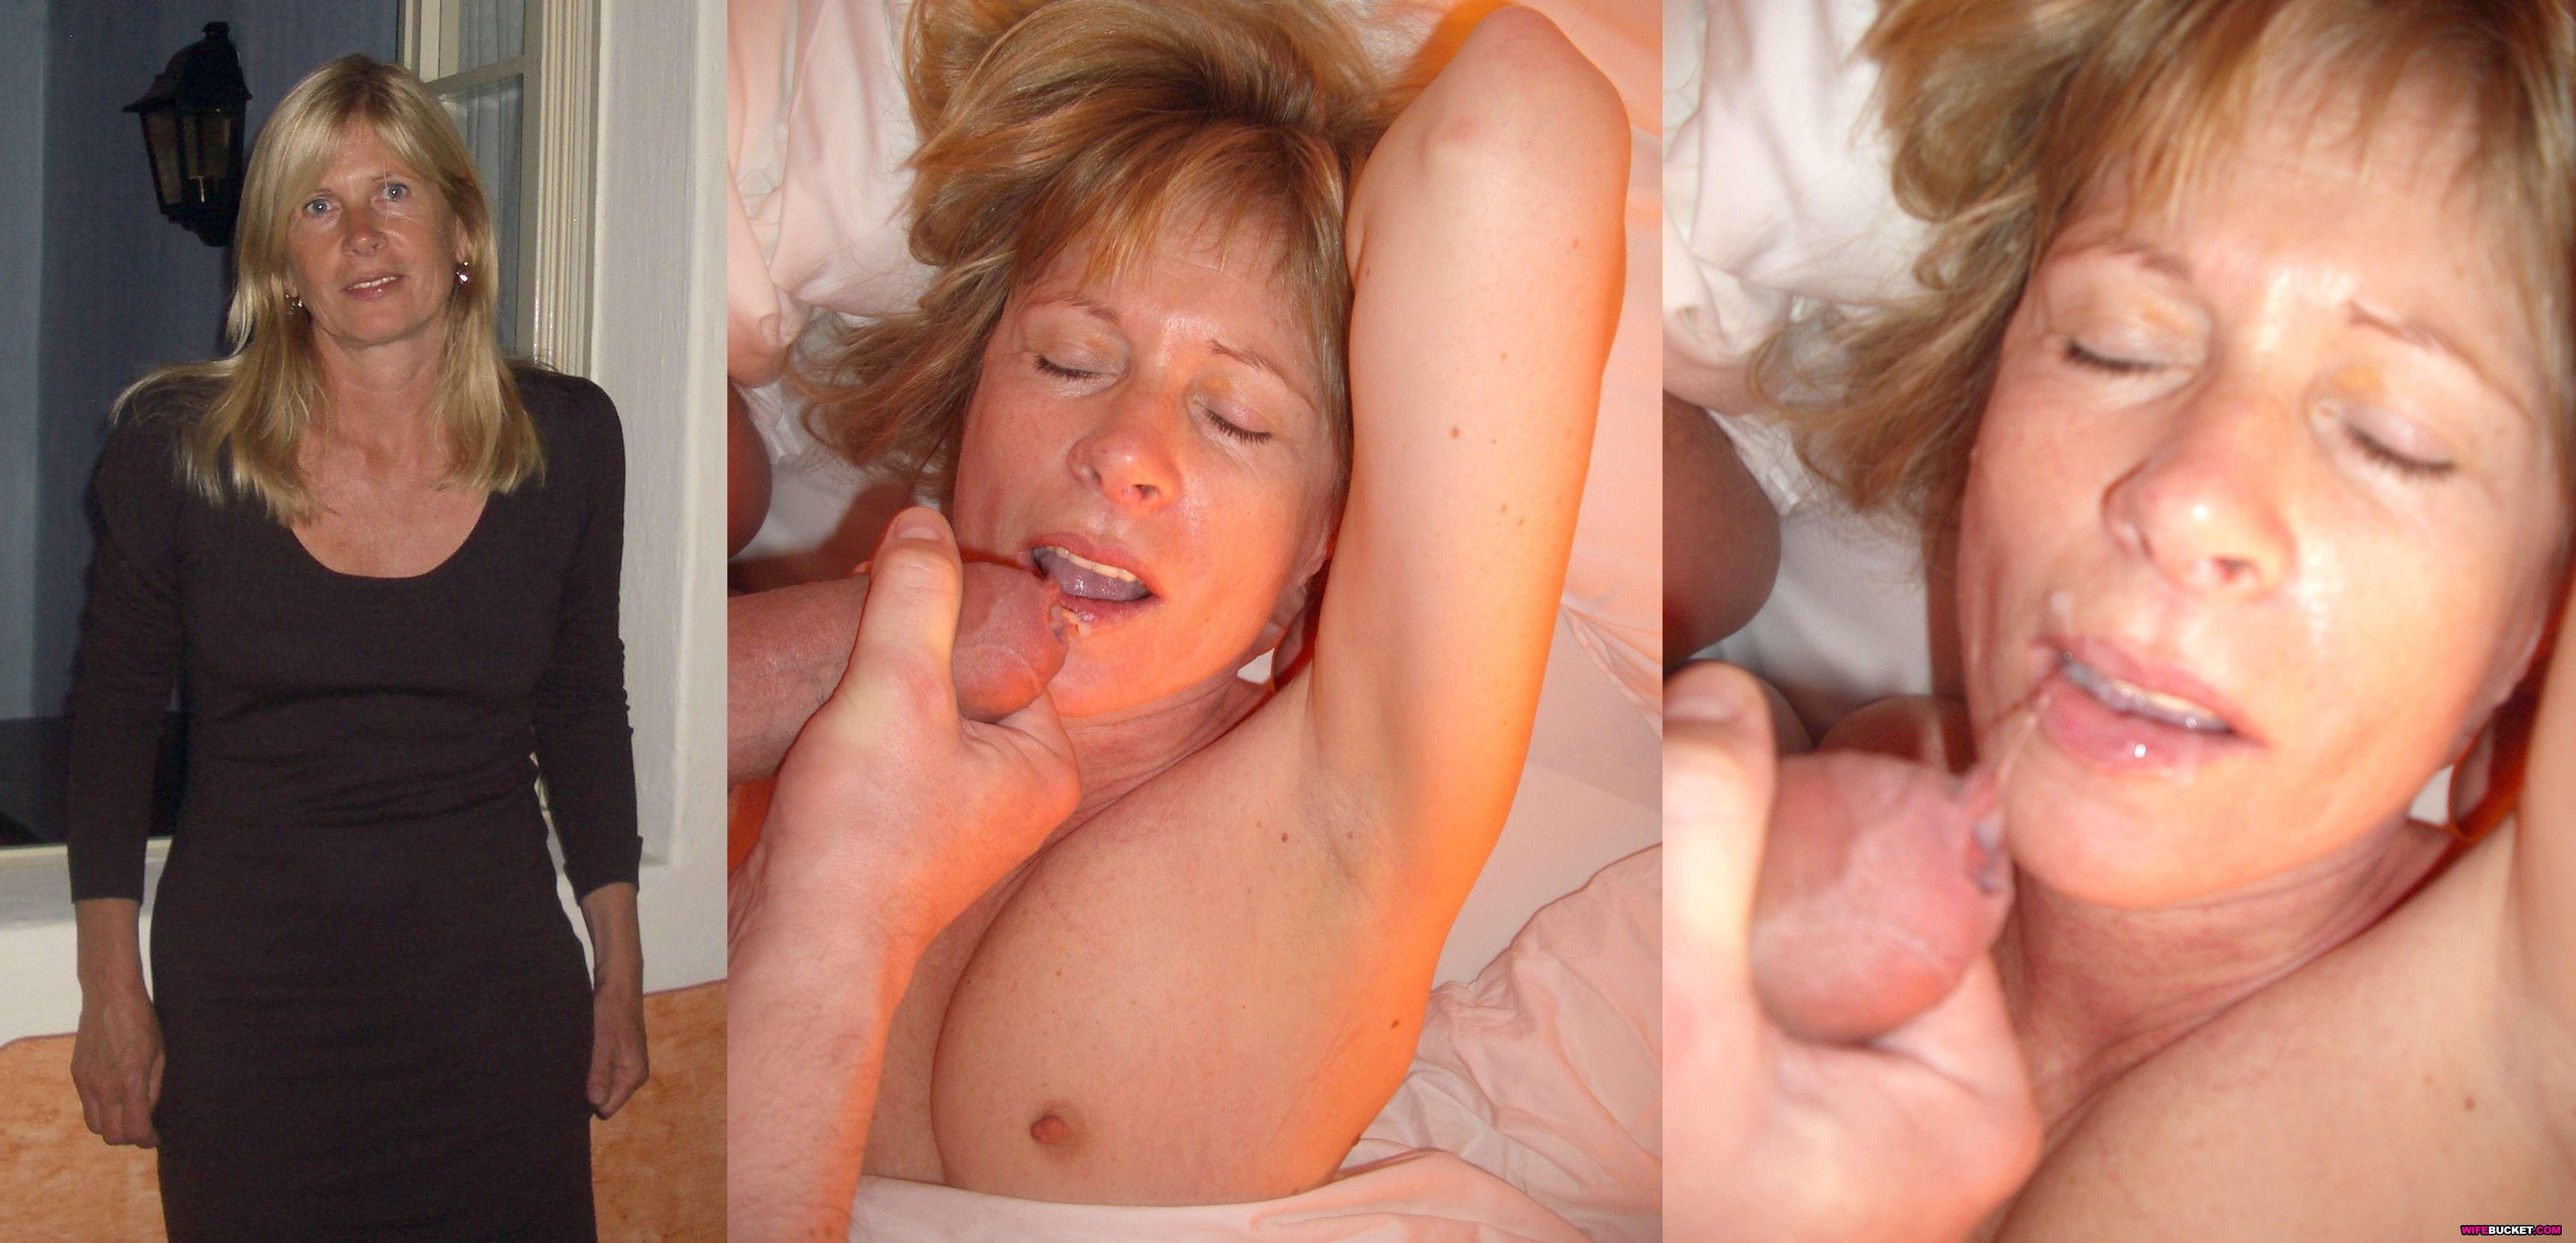 Boy stripped by older girl porn